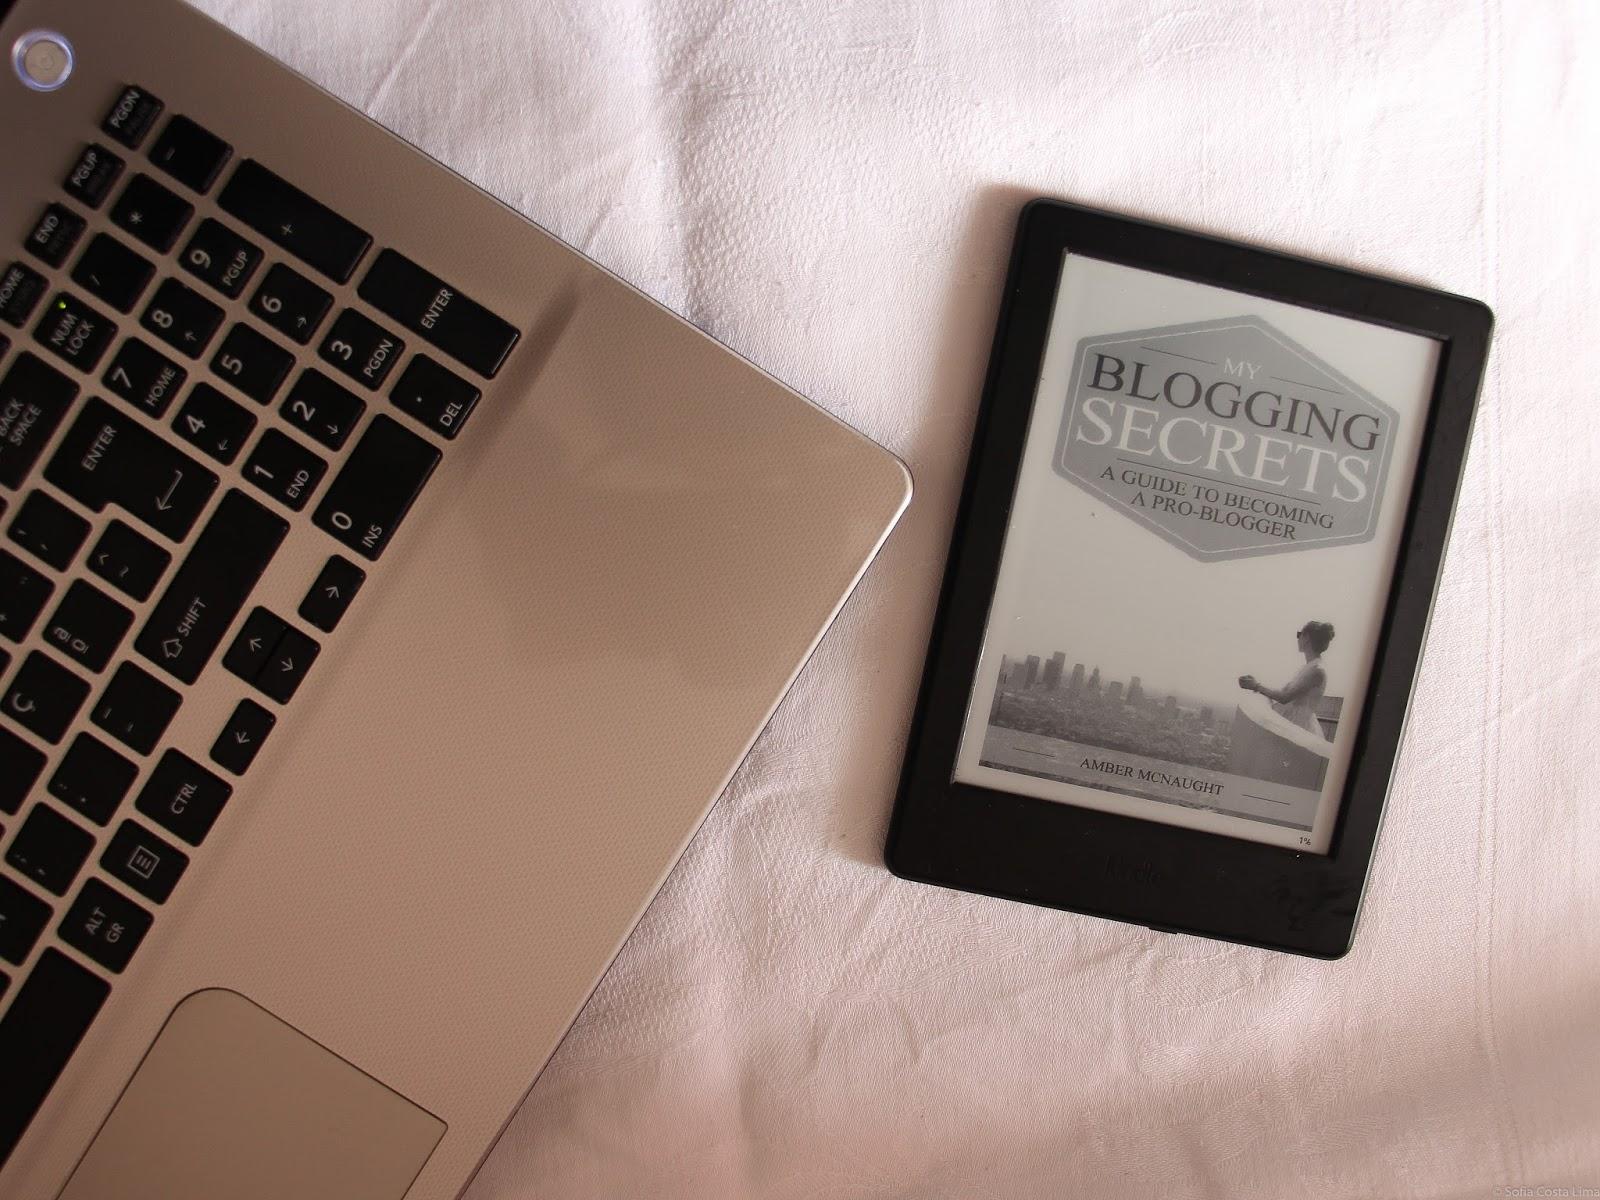 My Blogging Secrets - Amber McNaught